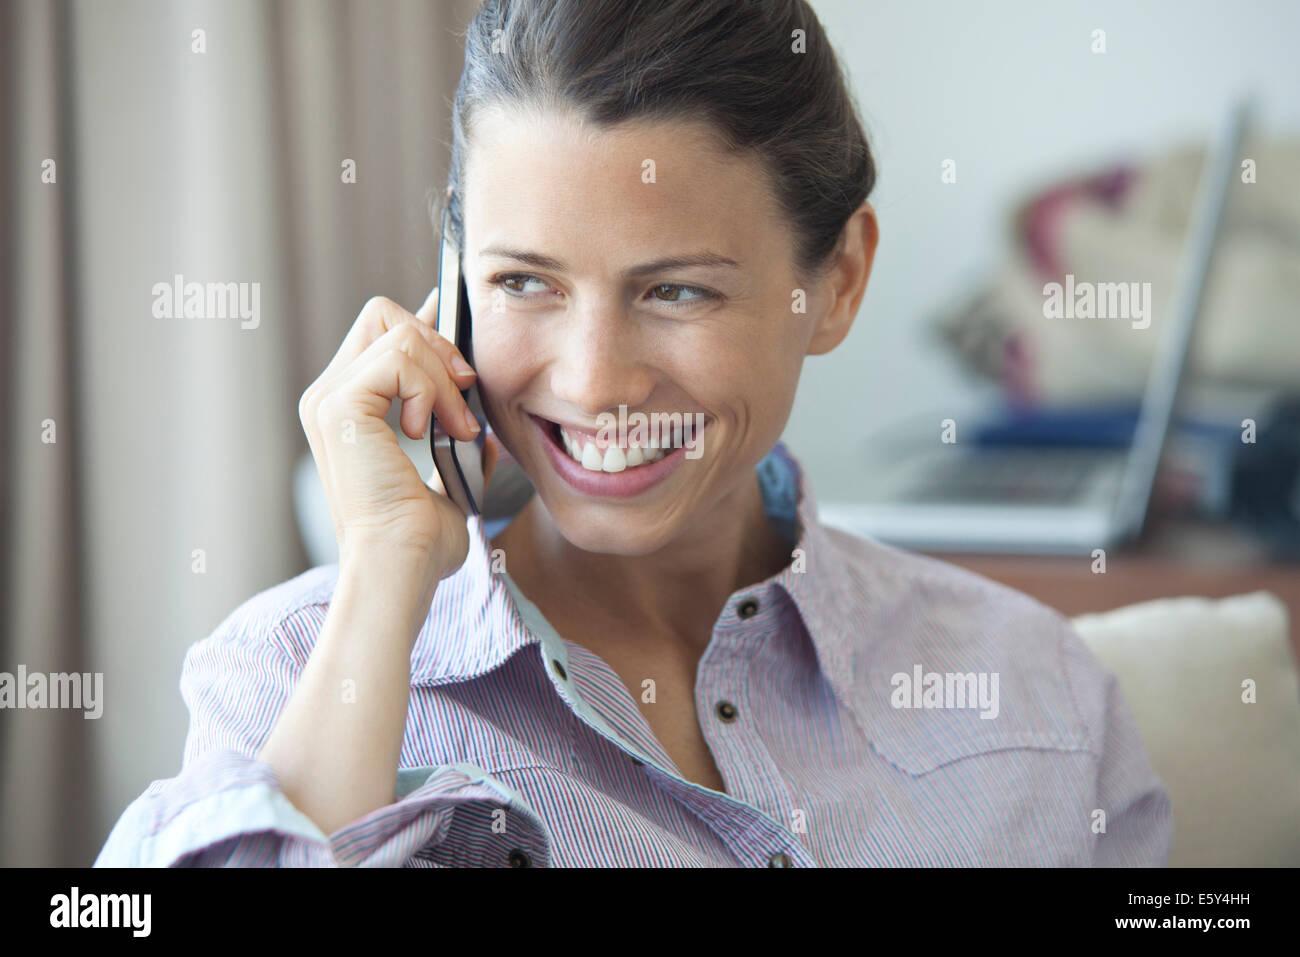 Woman enjoying cell phone conversation - Stock Image